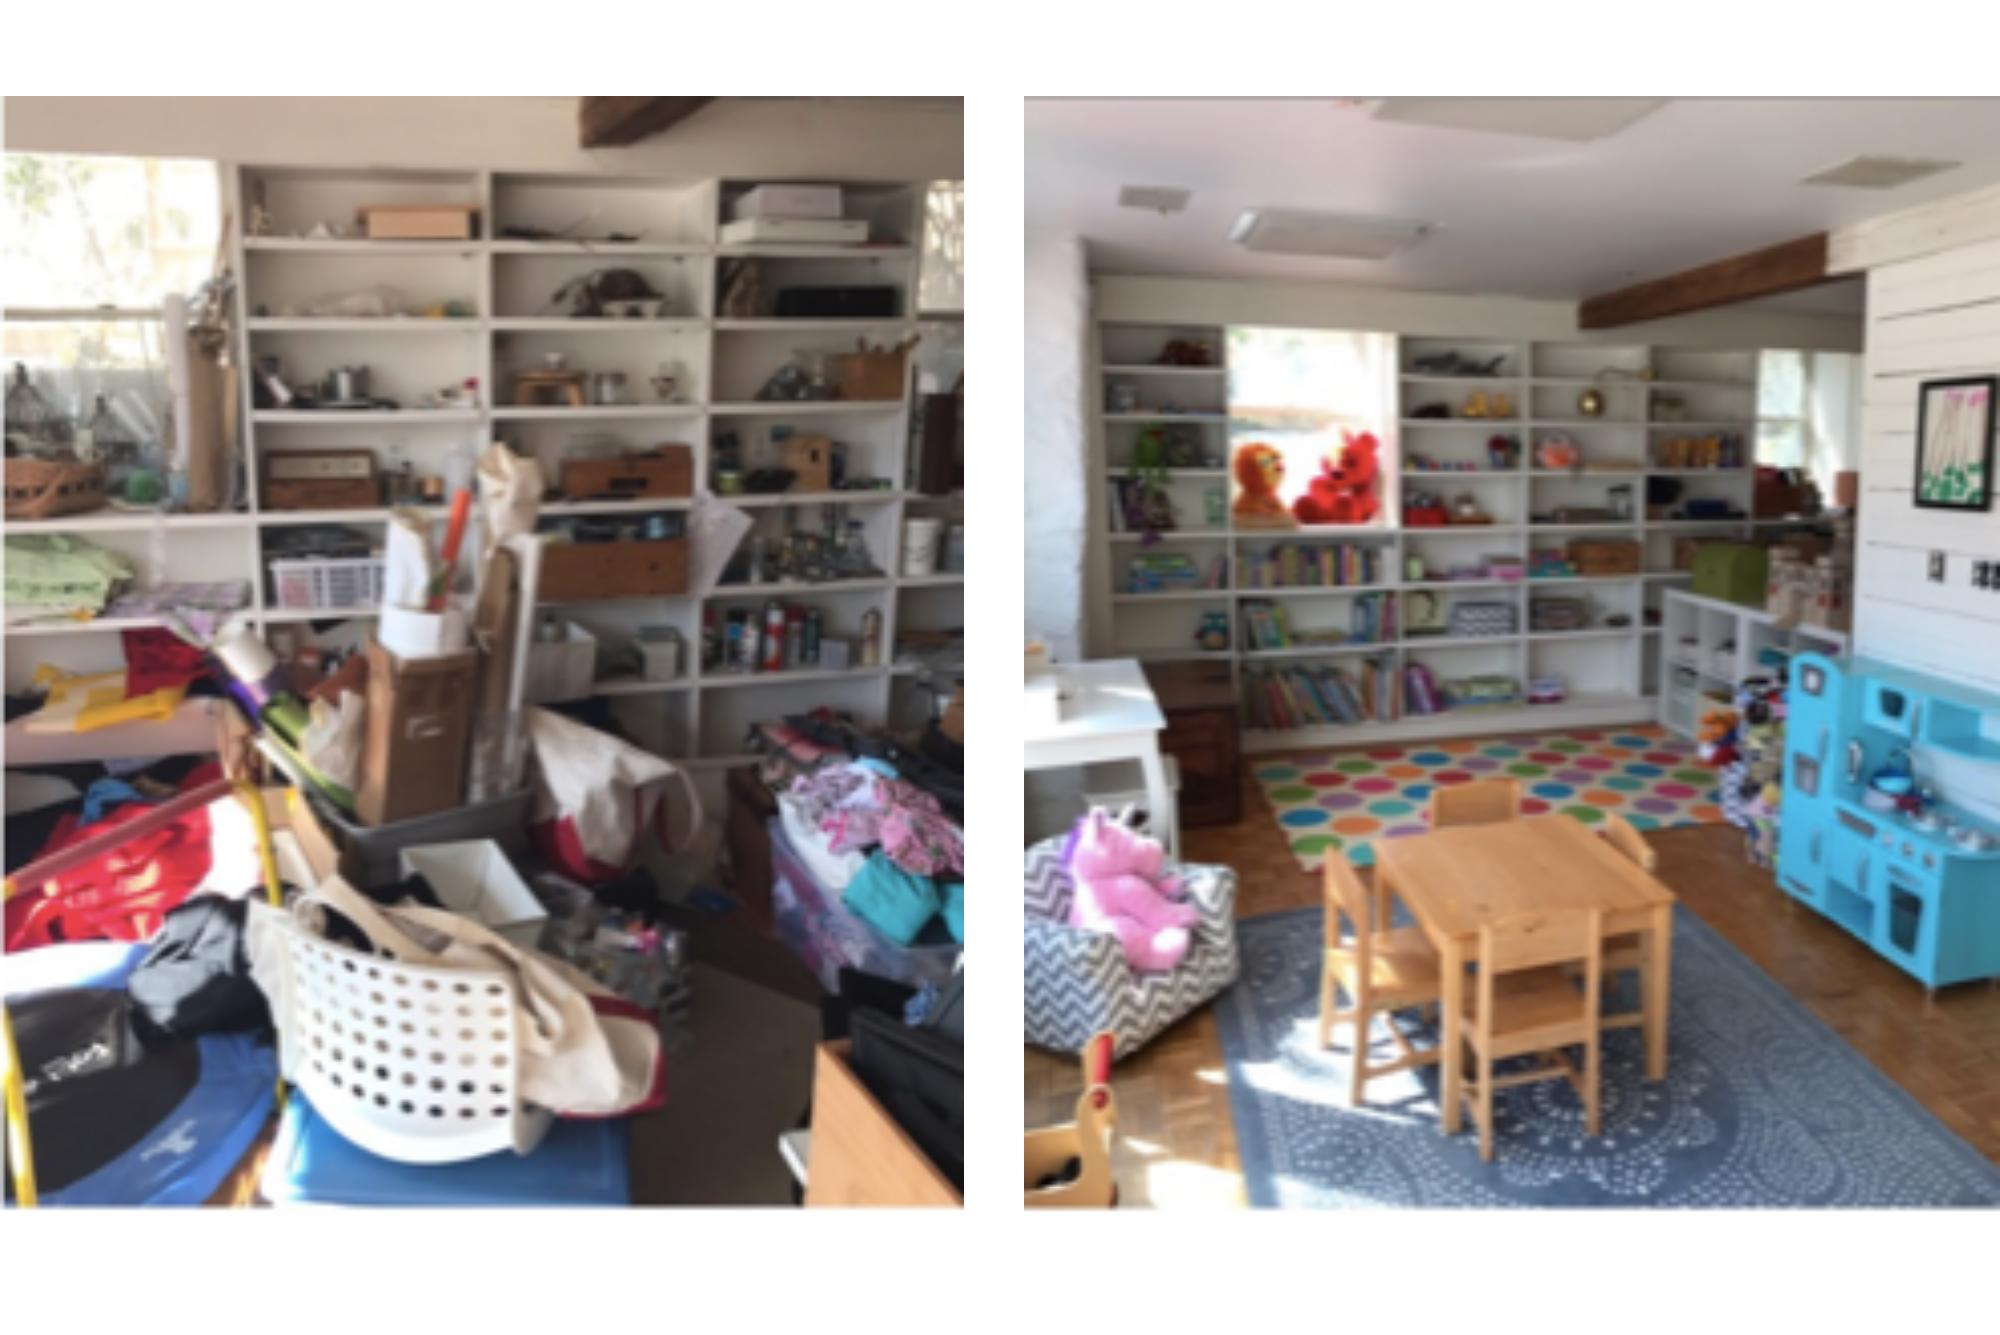 RoomtoBreatheOrganizing-BeforeAfter-11.png